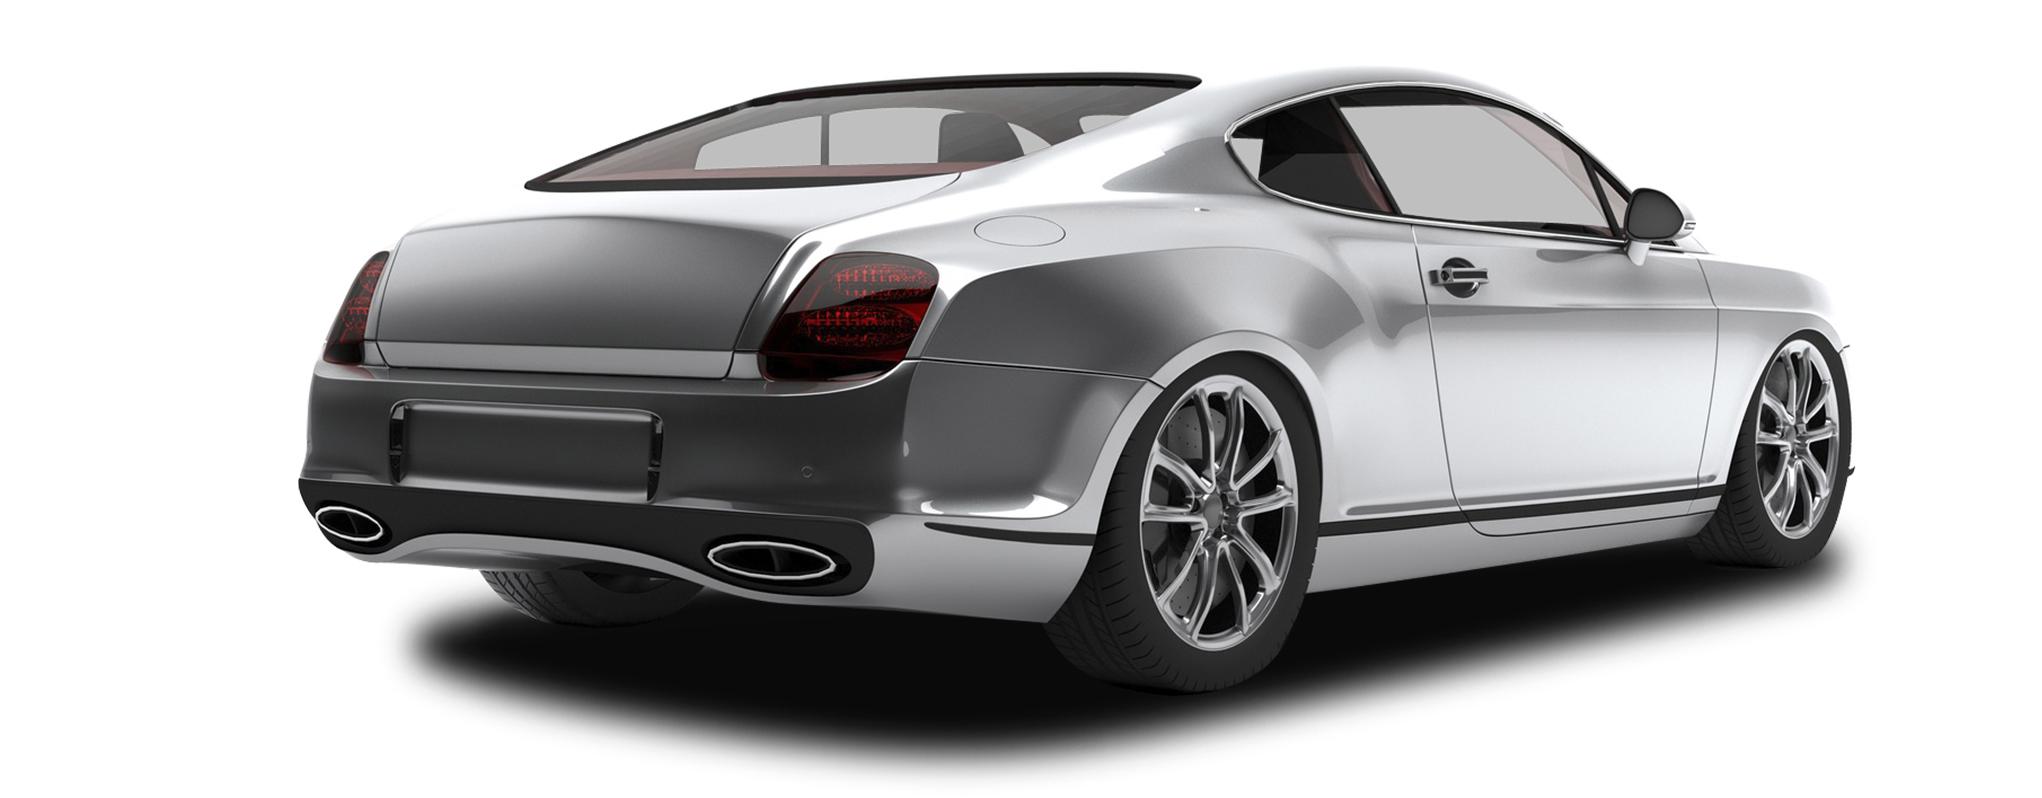 Fahrzeugvermarktung-Fahrzeug Freisteller2